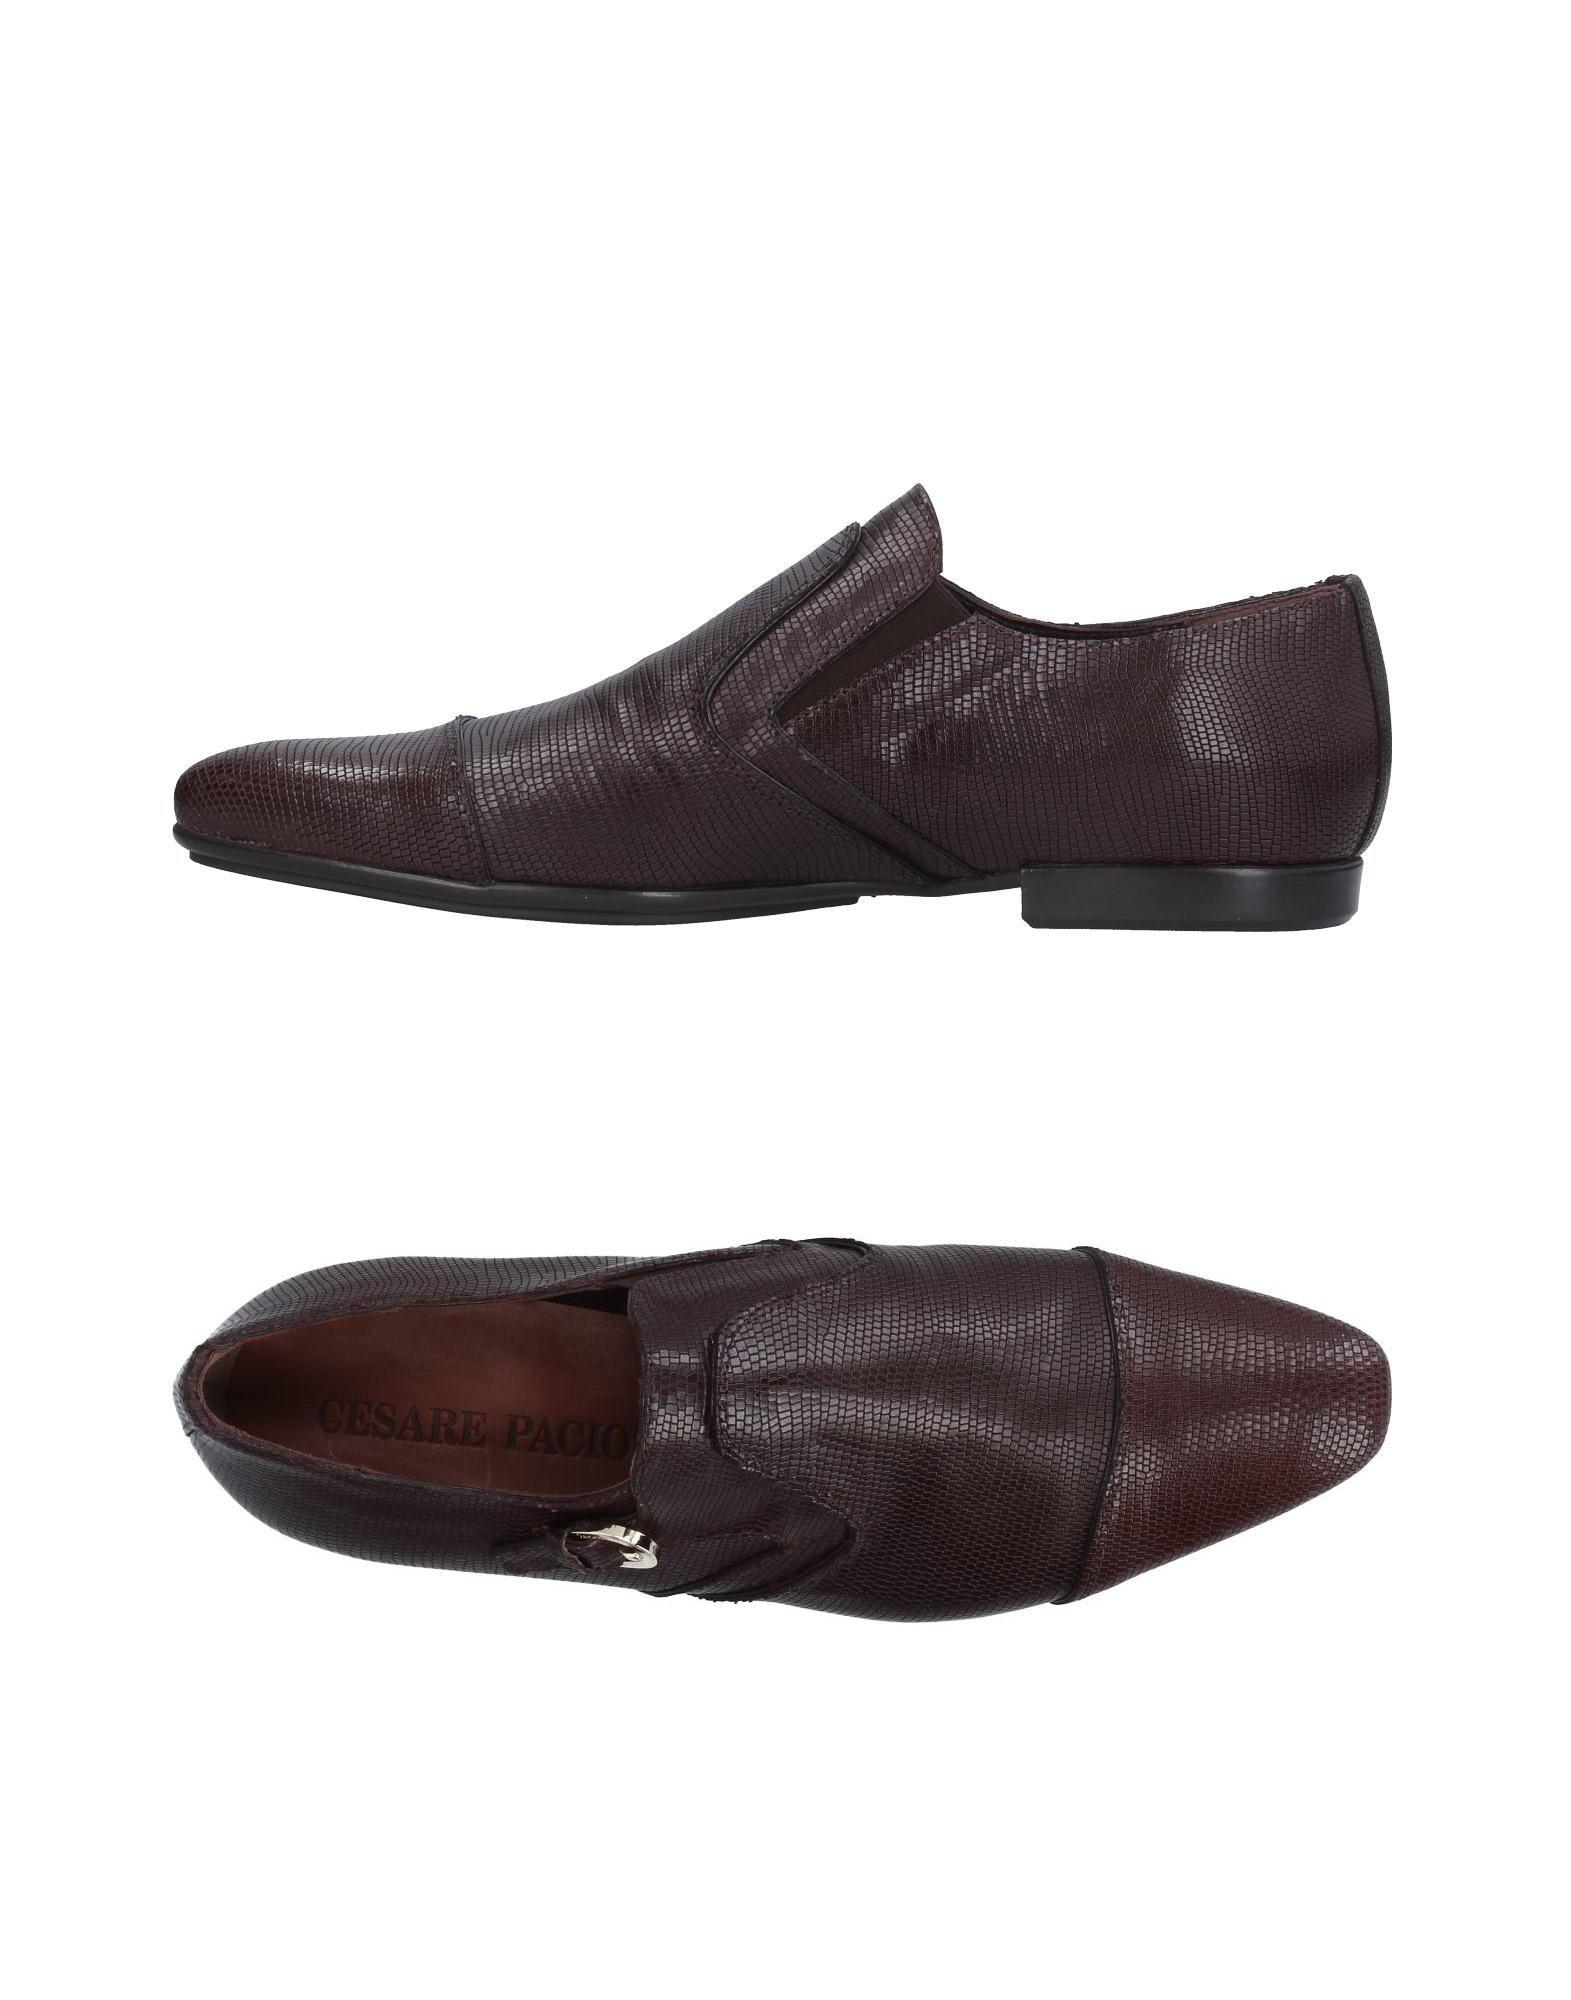 Cesare Paciotti Loafers - Men Cesare Paciotti Loafers - online on  Canada - Loafers 11326305HL 260b27